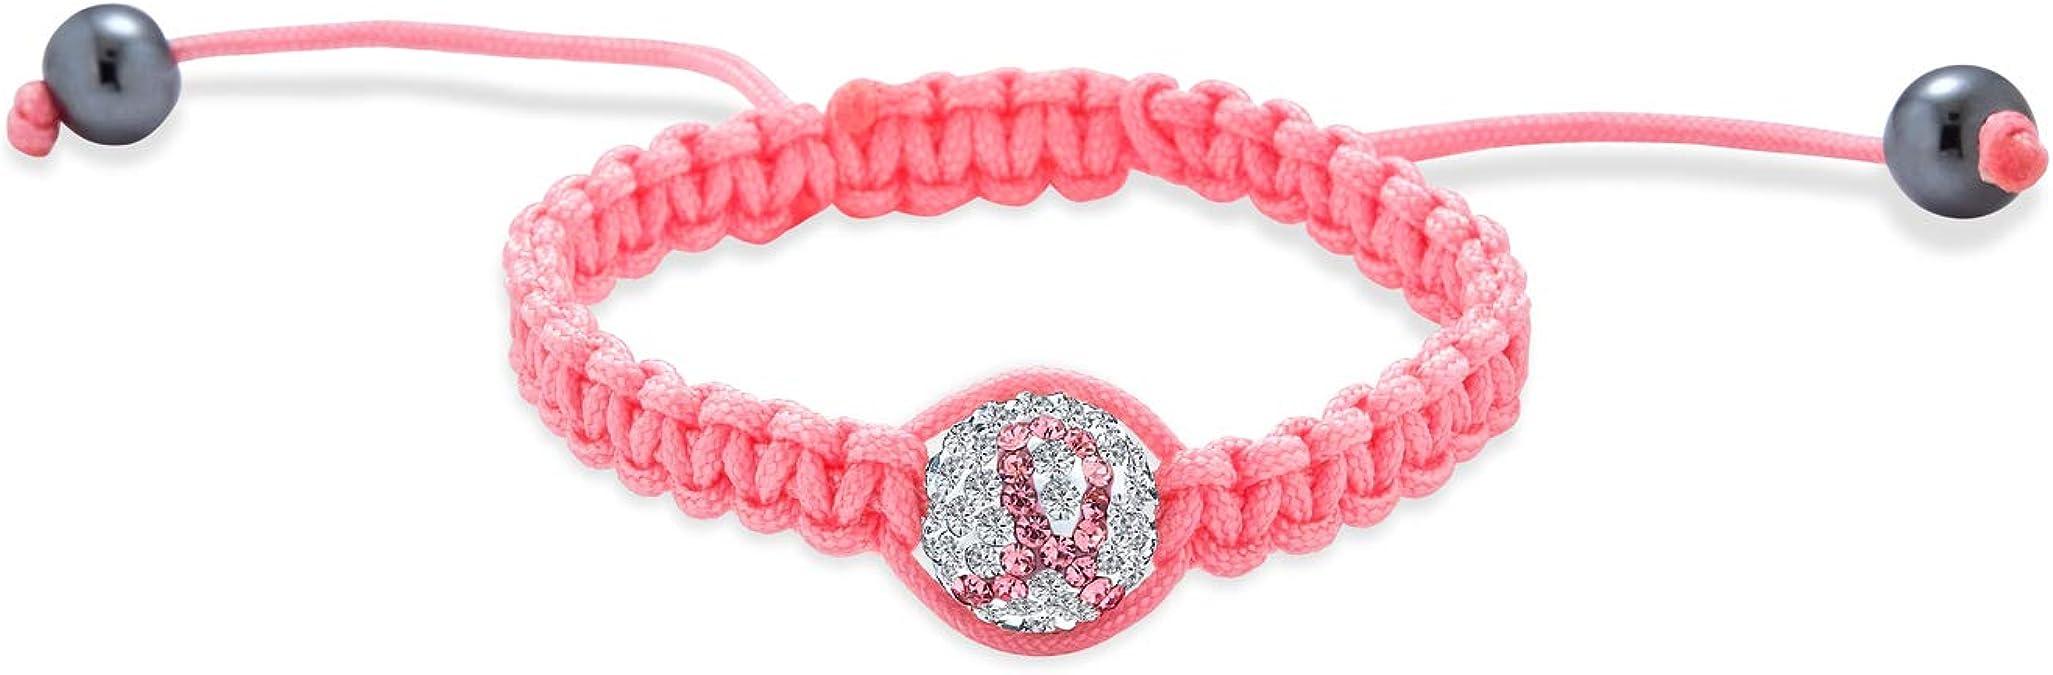 Sparkling Pink Ribbon Breast Cancer Awareness Memory Wire Beaded BraceletWrap bracelethopesupportpink ribbonOctobergift